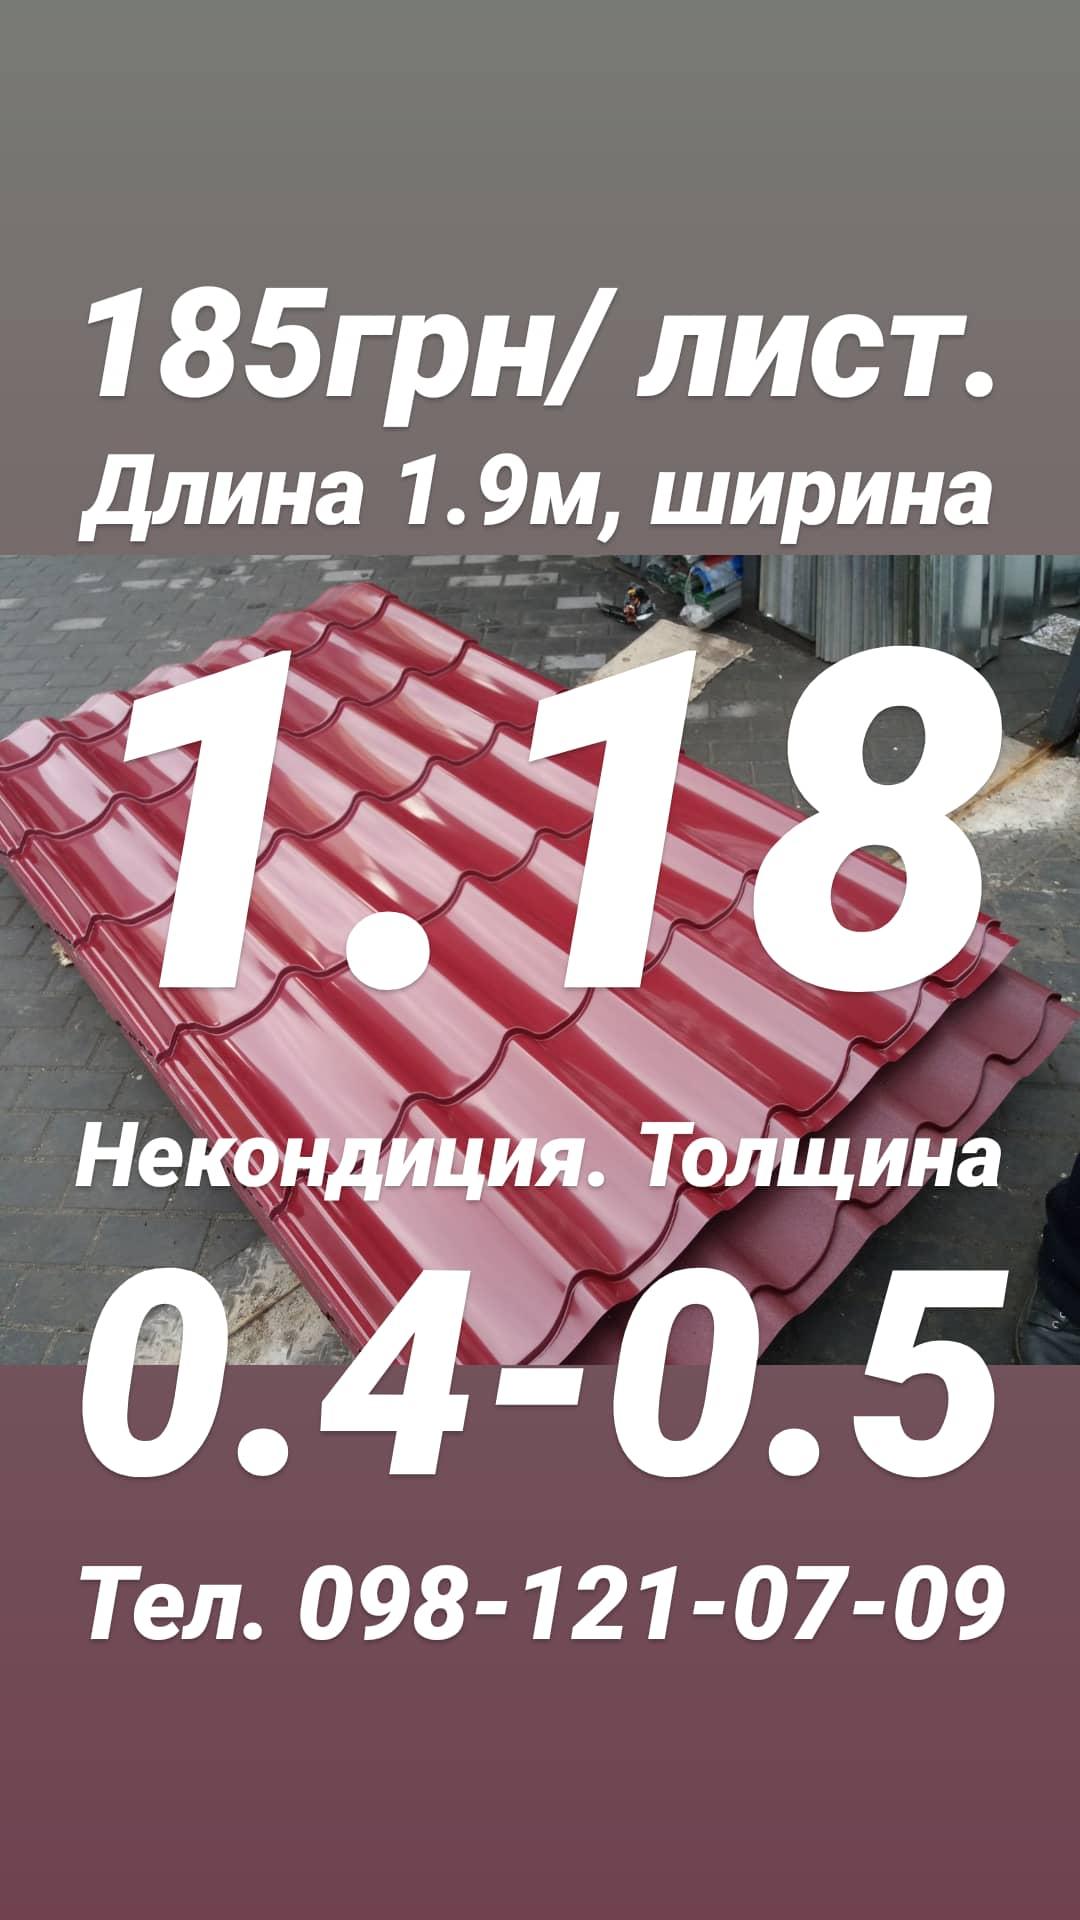 IMG_20200220_091637_261